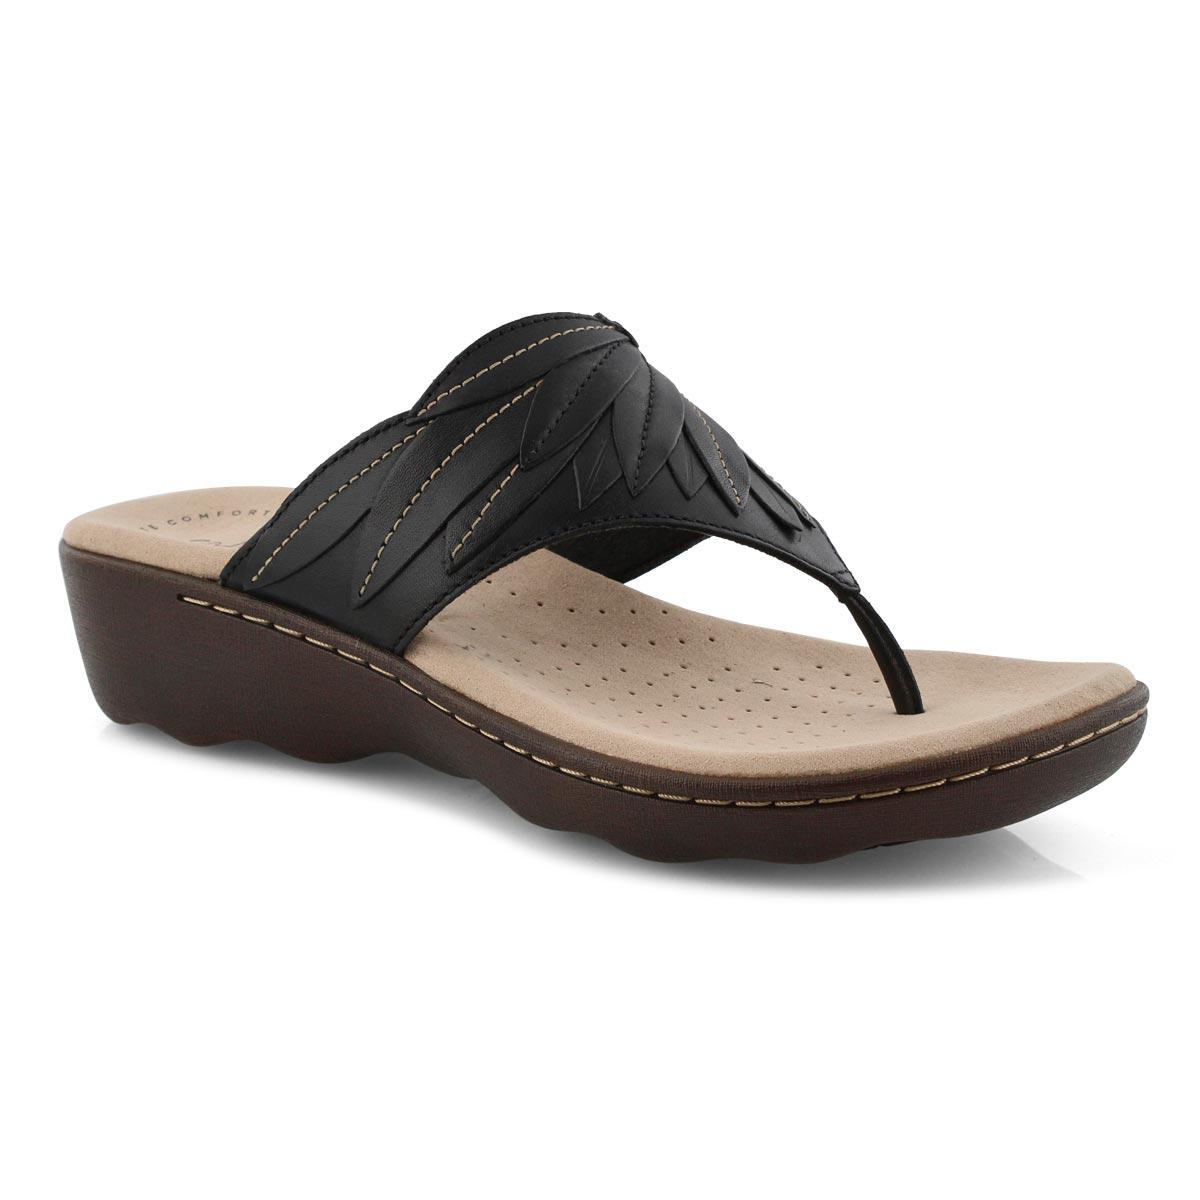 Lds Phebe Pearl black wedge thong sndl